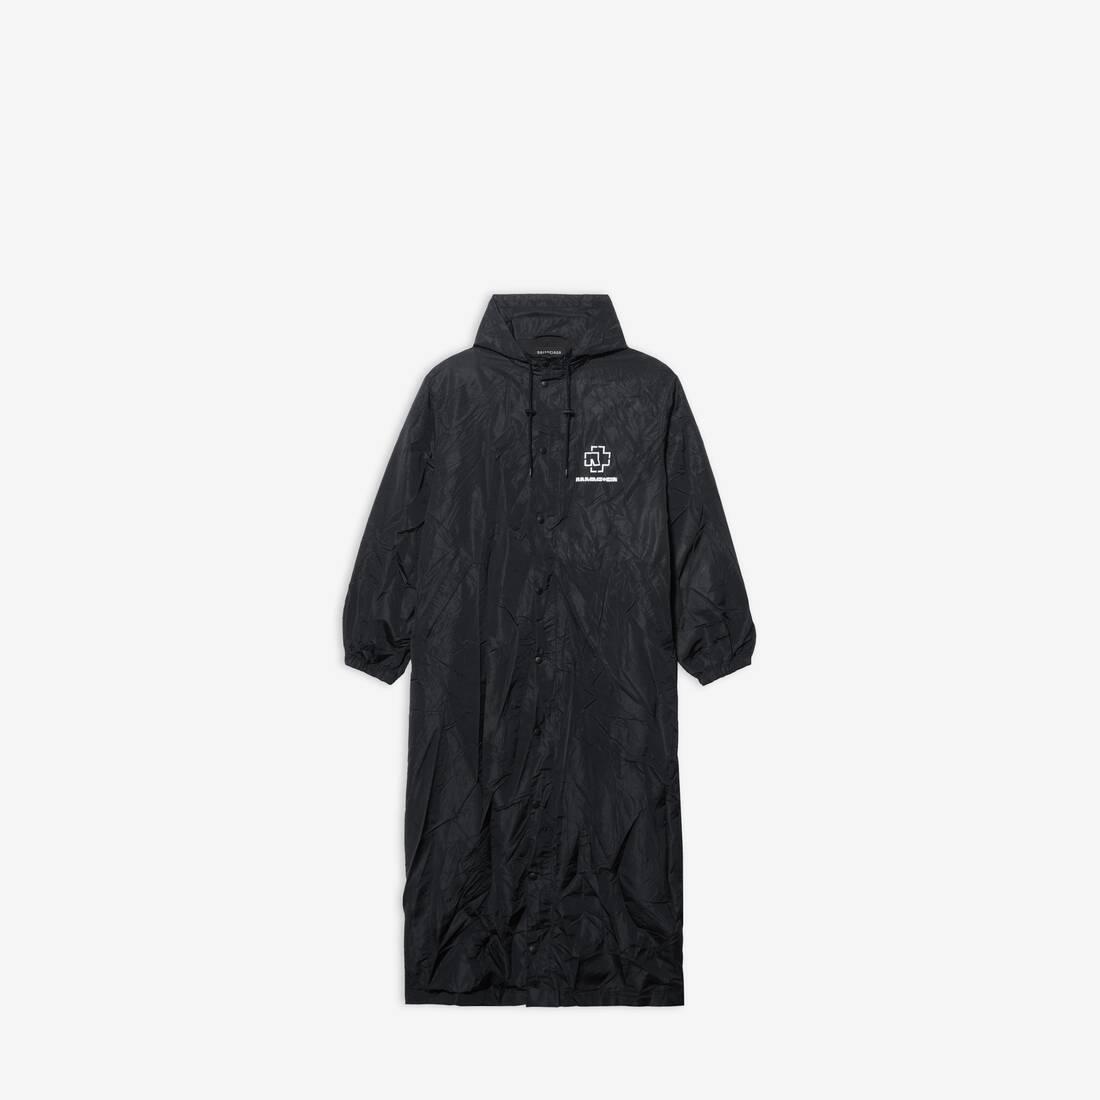 Display zoomed version of rammstein raincoat 1